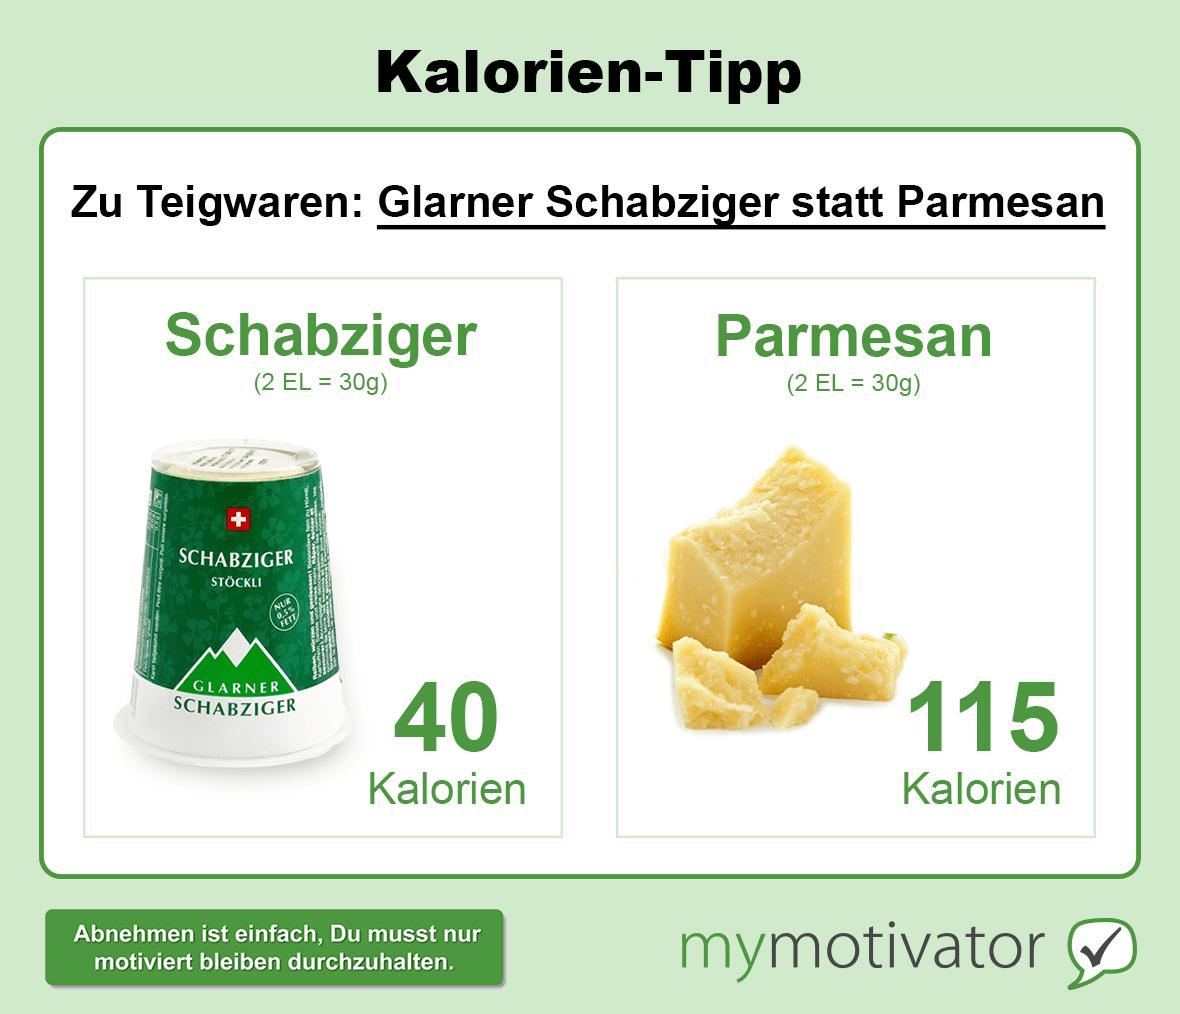 Kalorien-Tipps - MyMotivator: Motivation zum Abnehmen